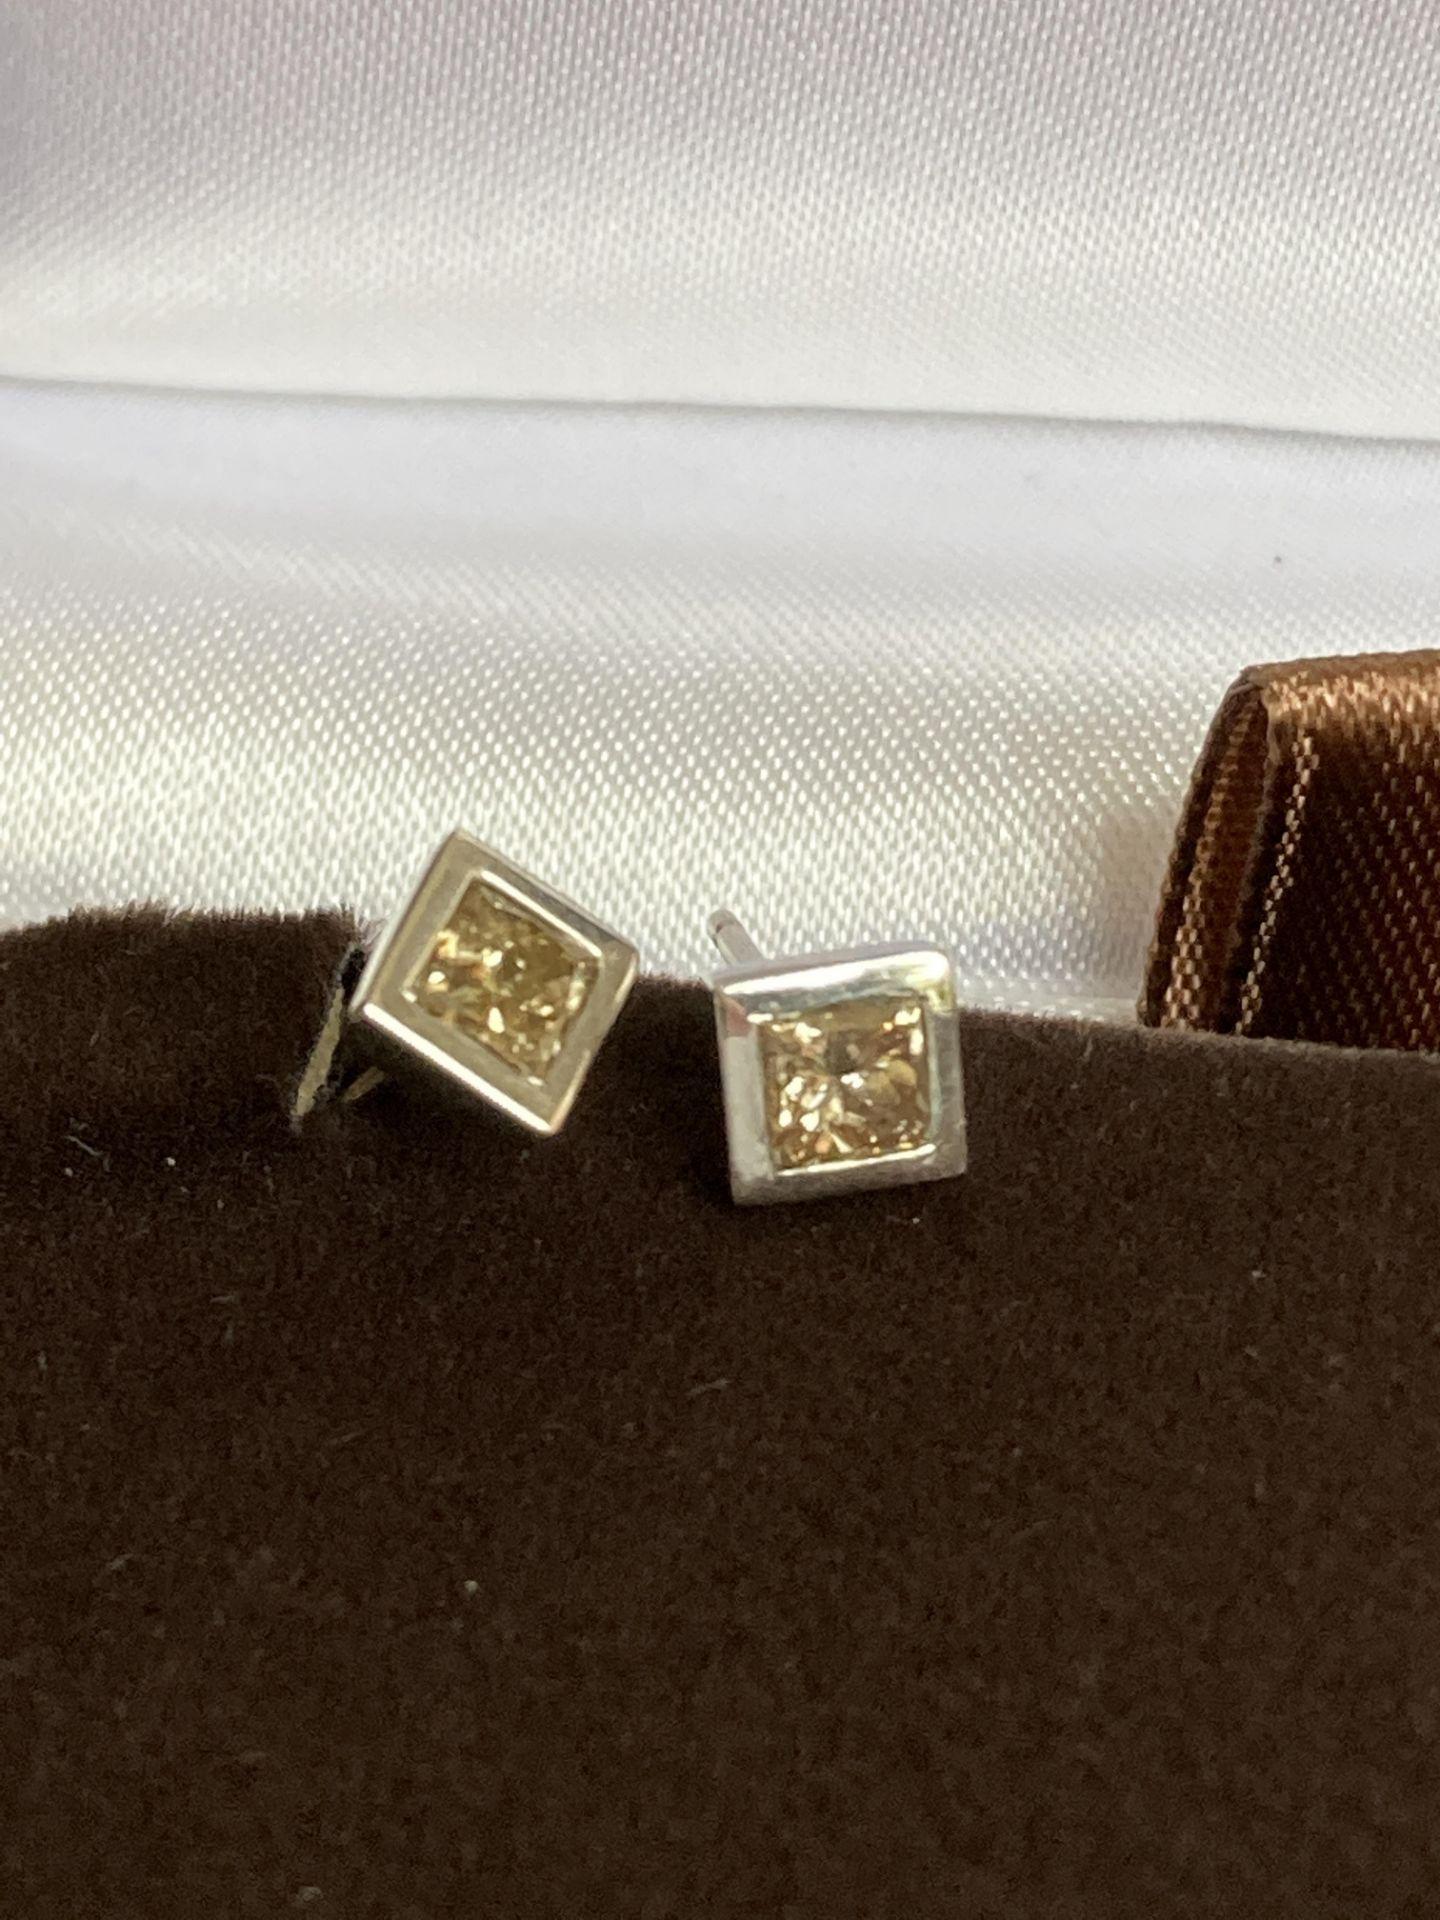 DIAMOND 18K EARRINGS - 0.55CT - Image 2 of 2